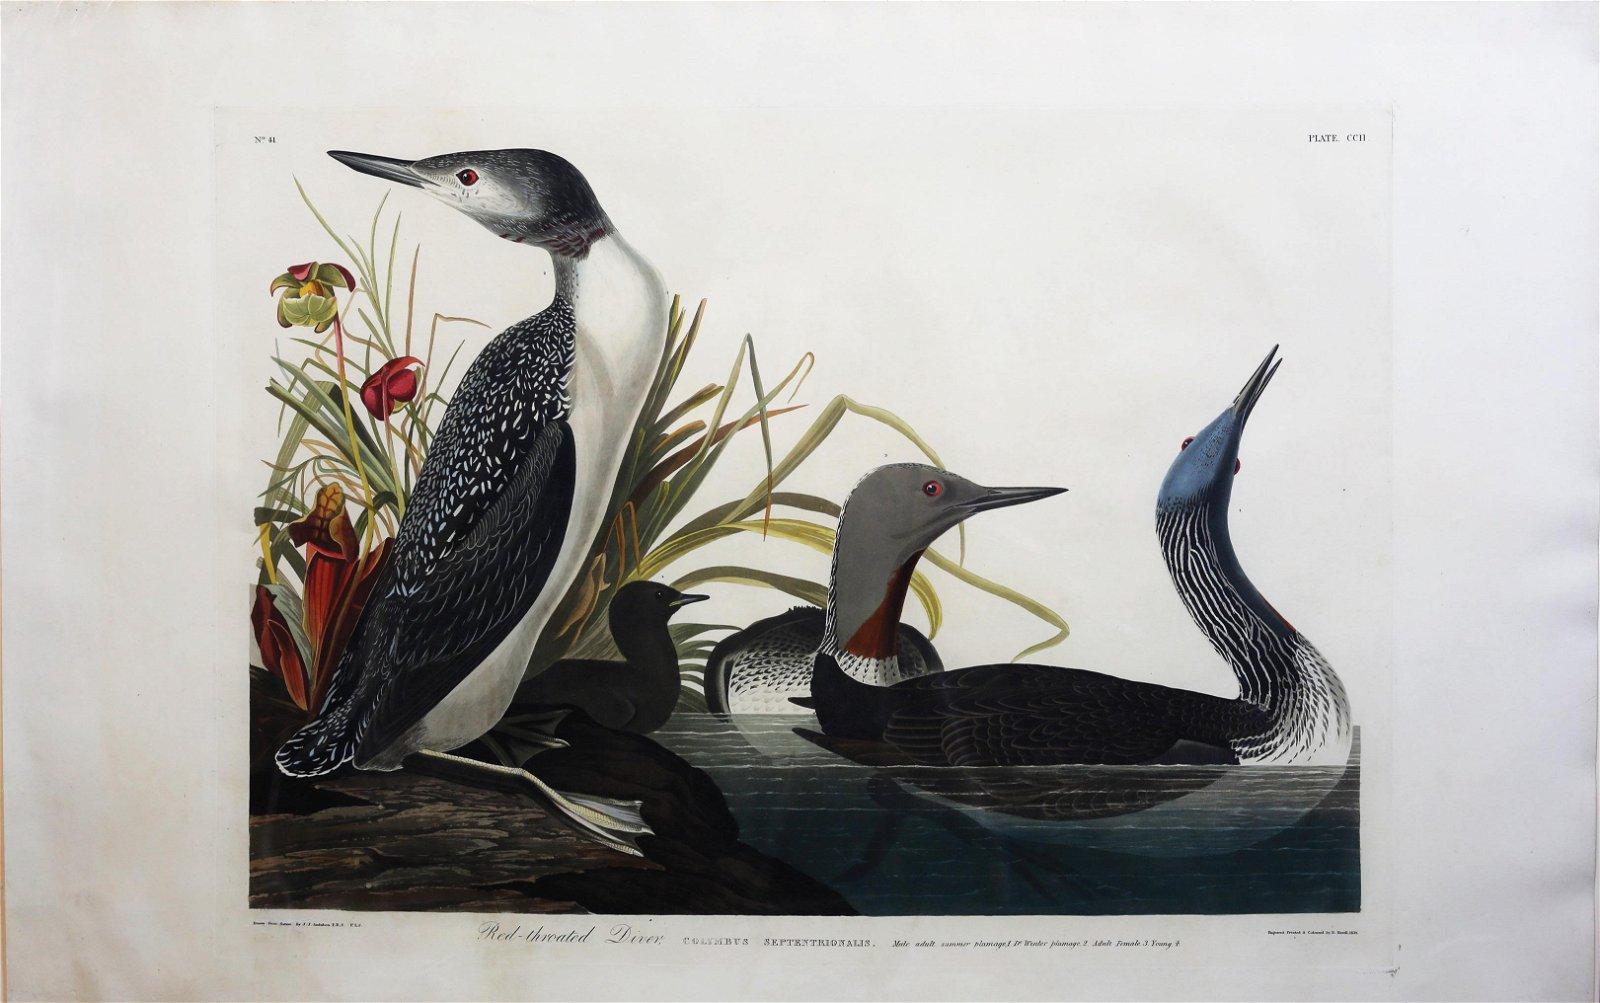 Audubon Aquatint Red-Throated Diver